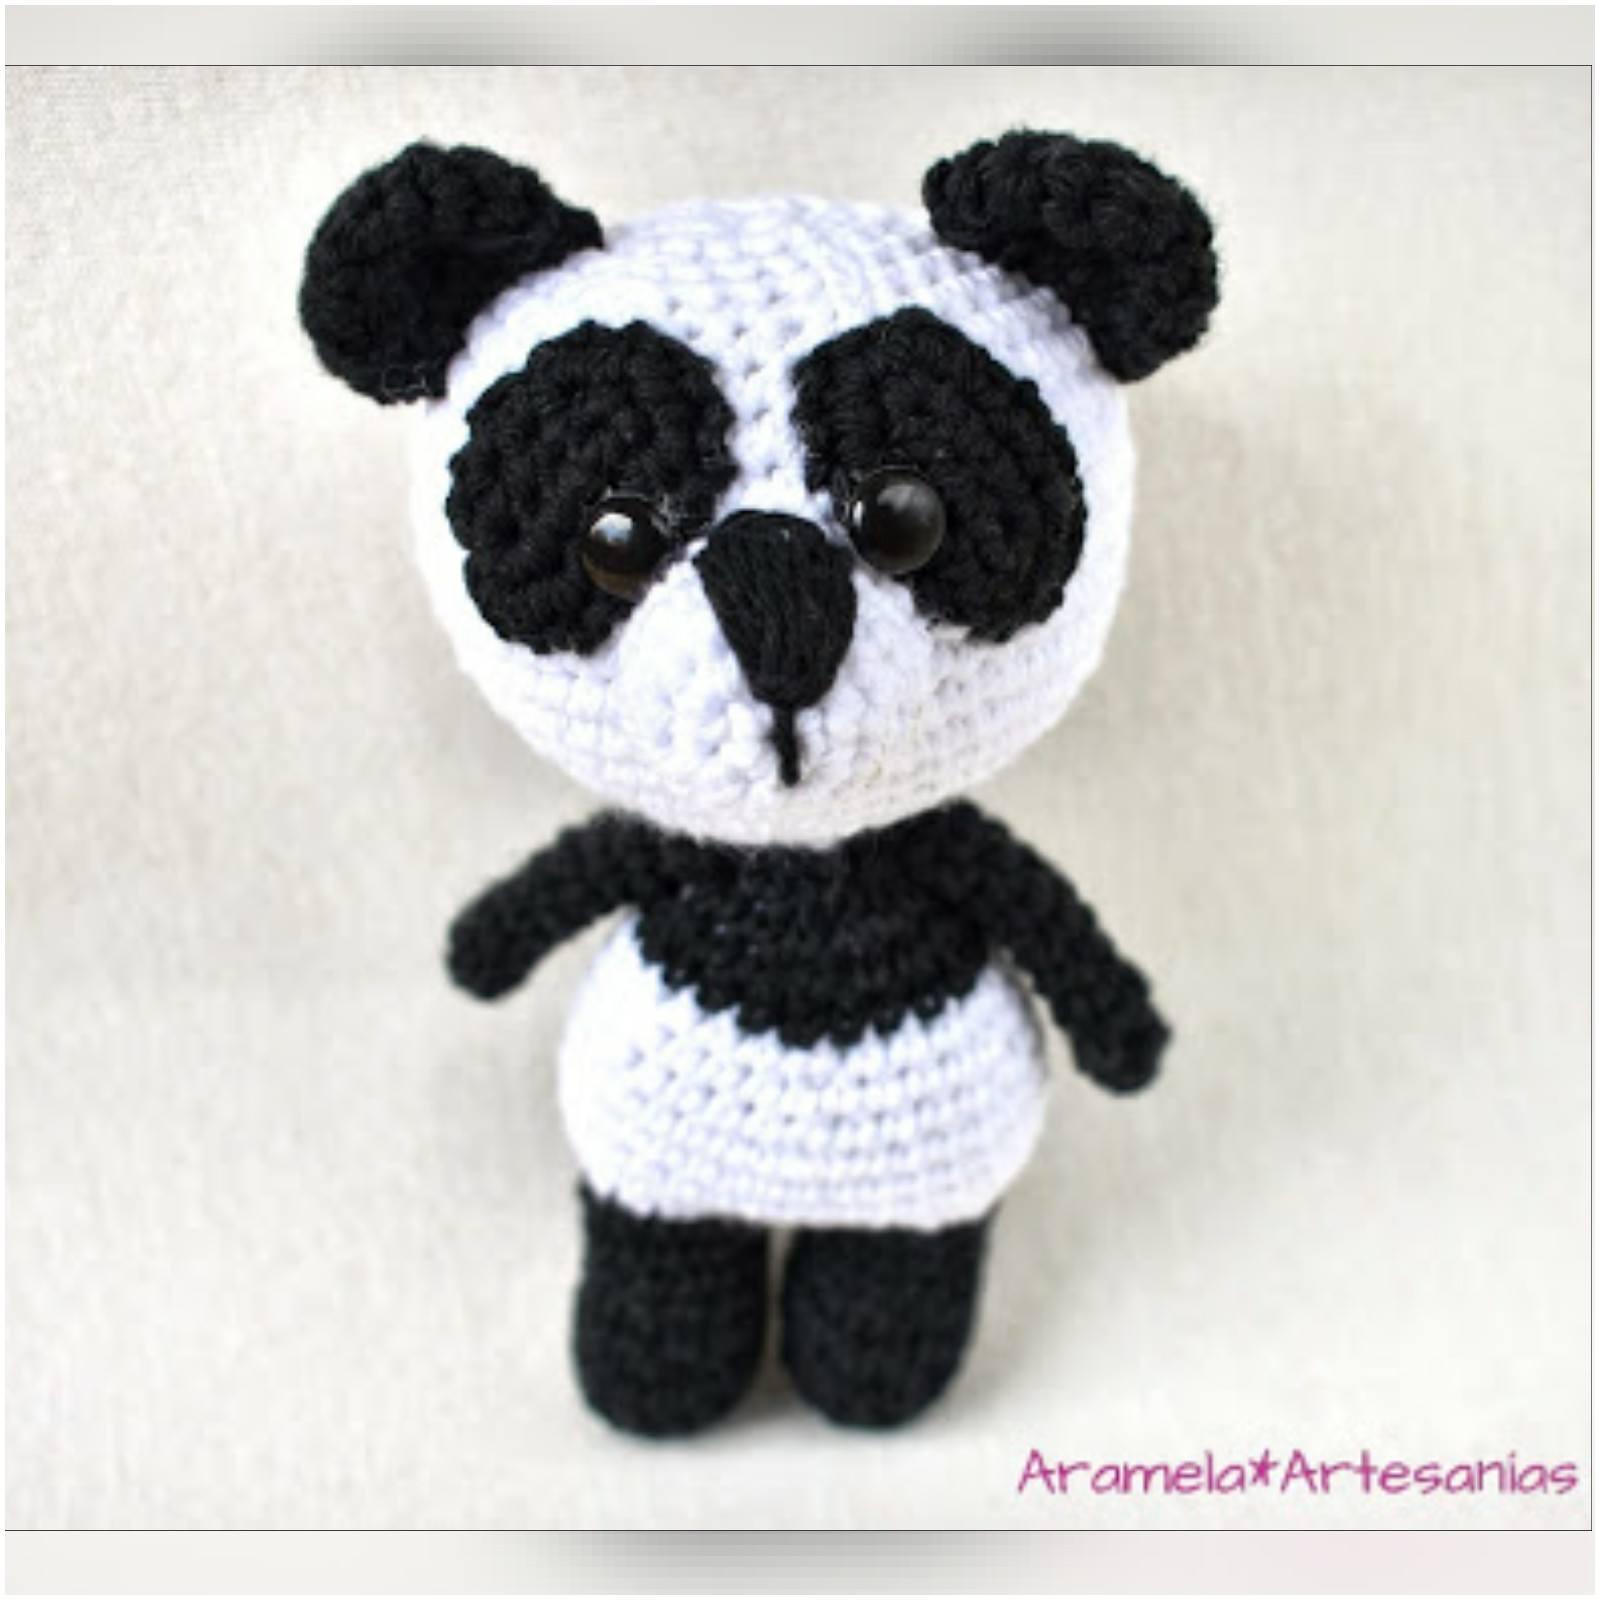 Amigurumislandia: Oso panda